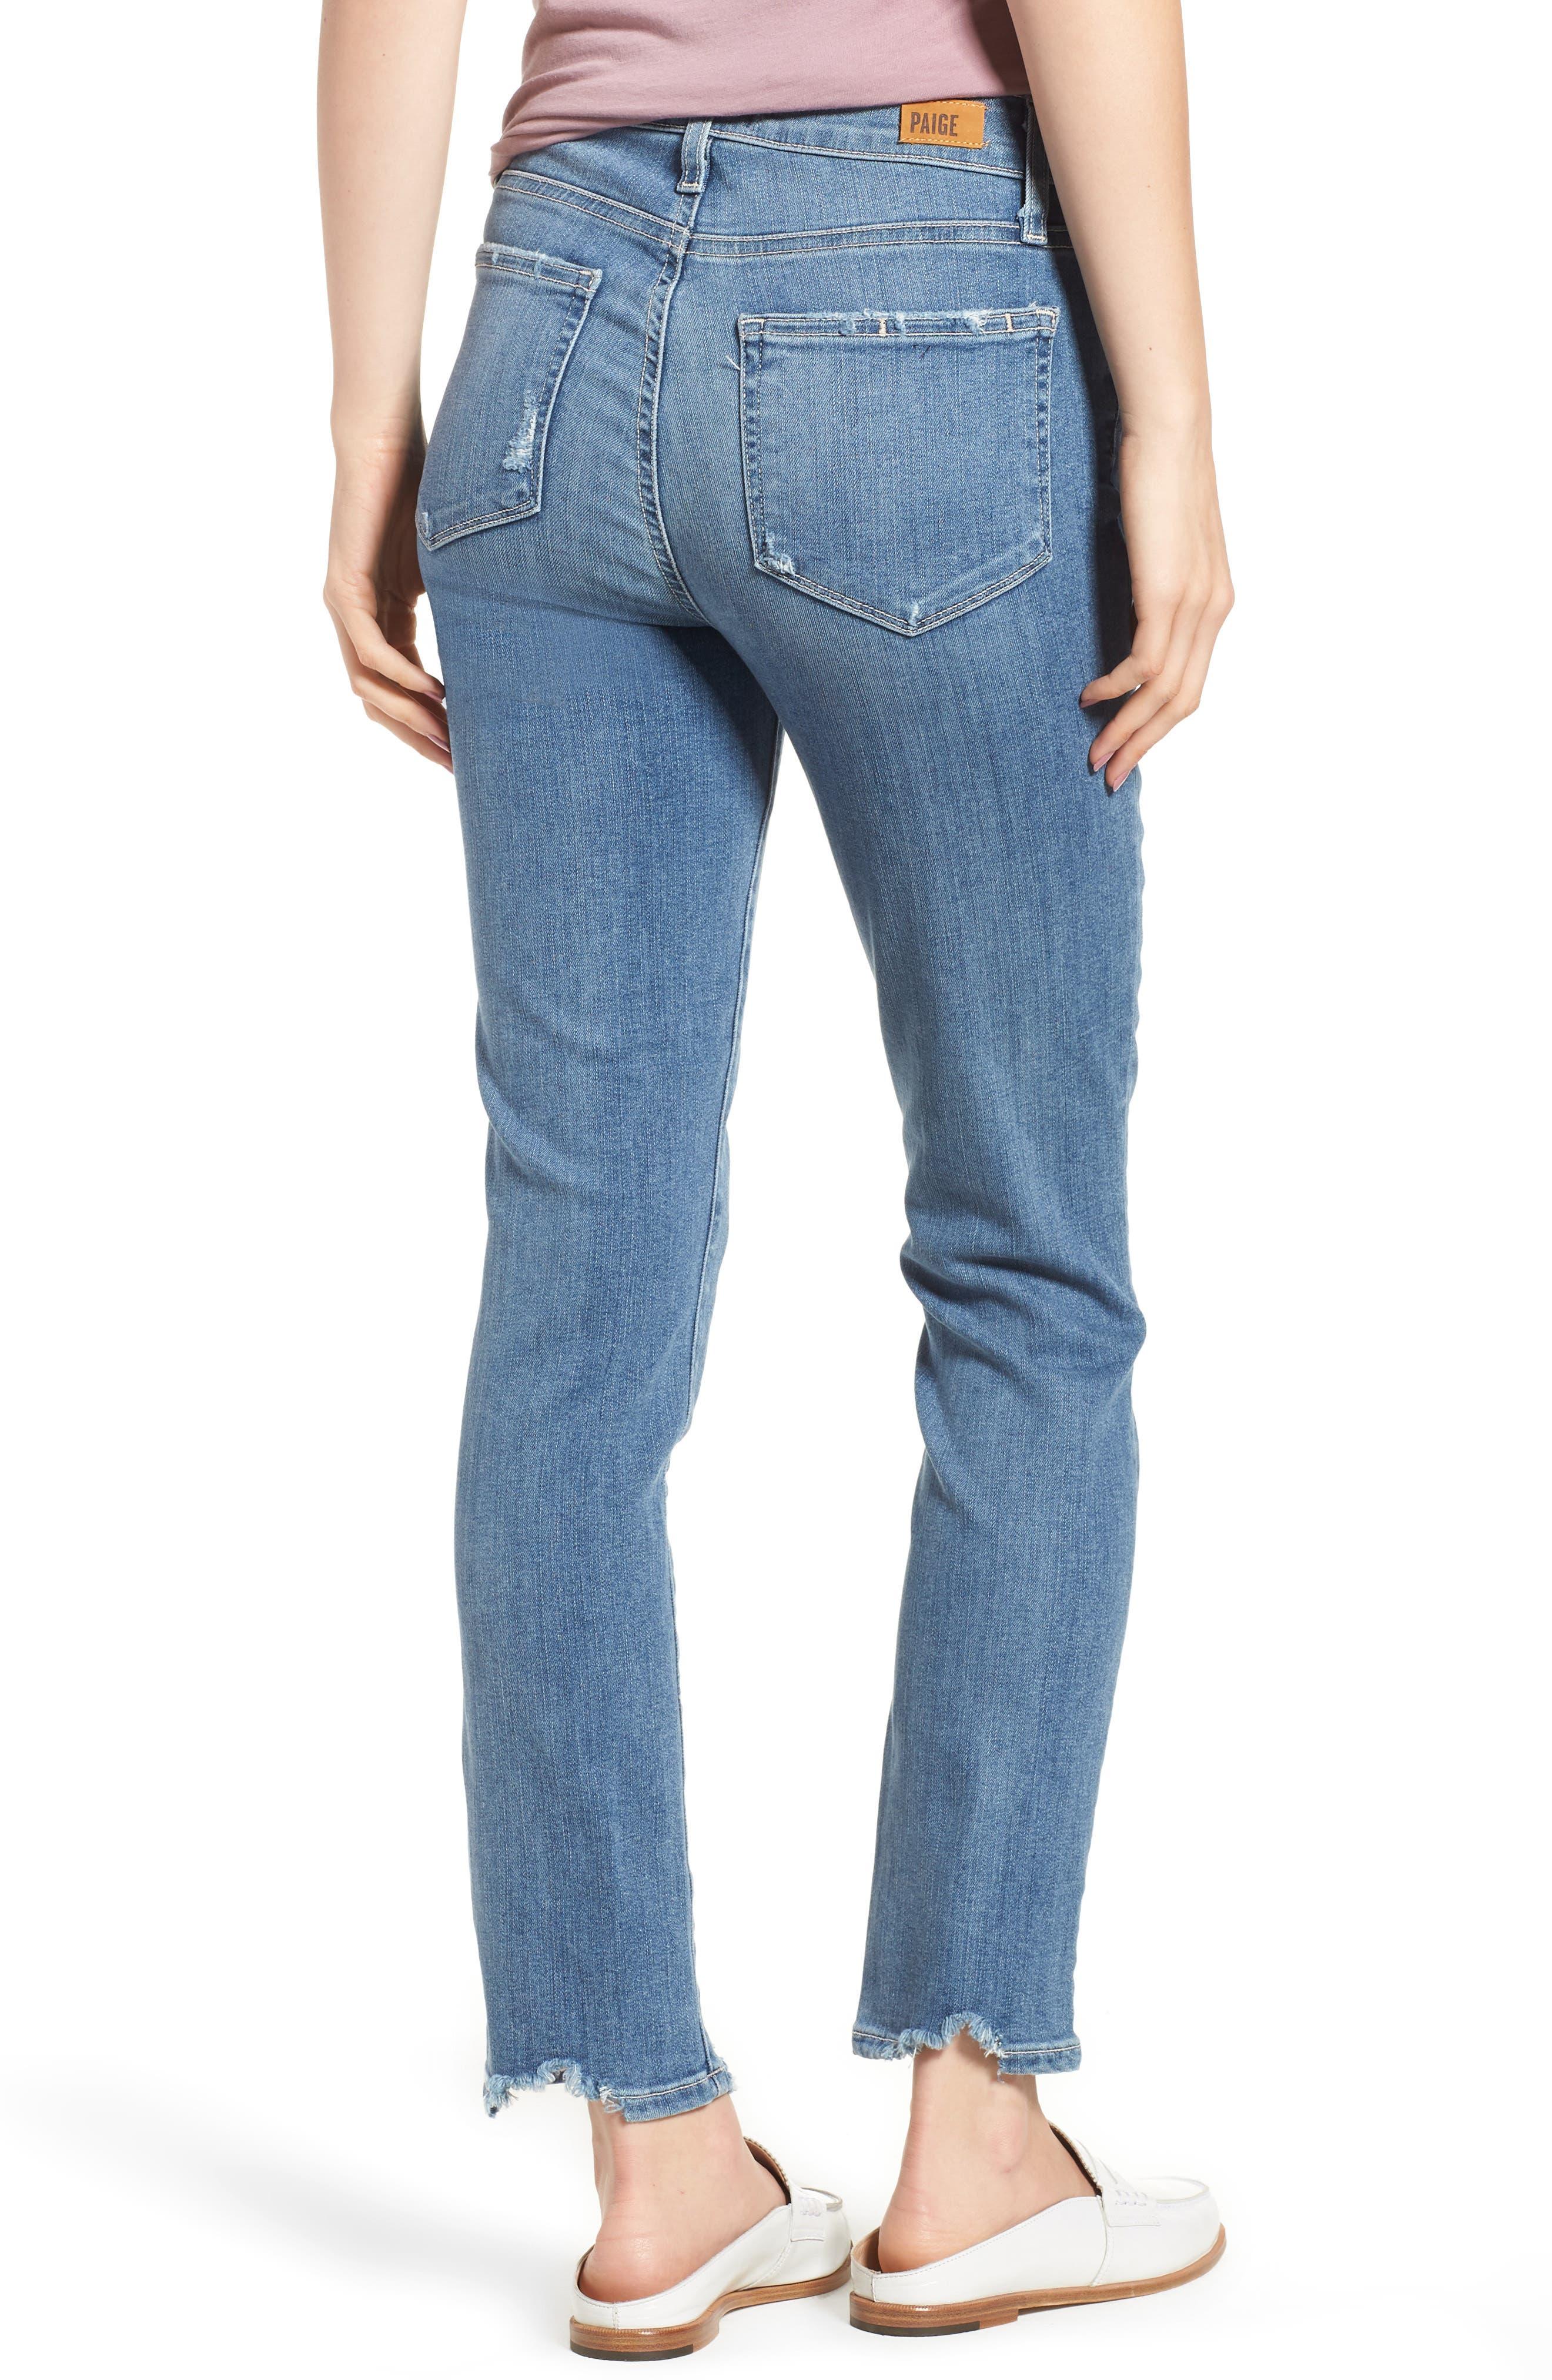 Transcend Vintage - Hoxton High Waist Ankle Skinny Jeans,                             Alternate thumbnail 2, color,                             ZAHARA